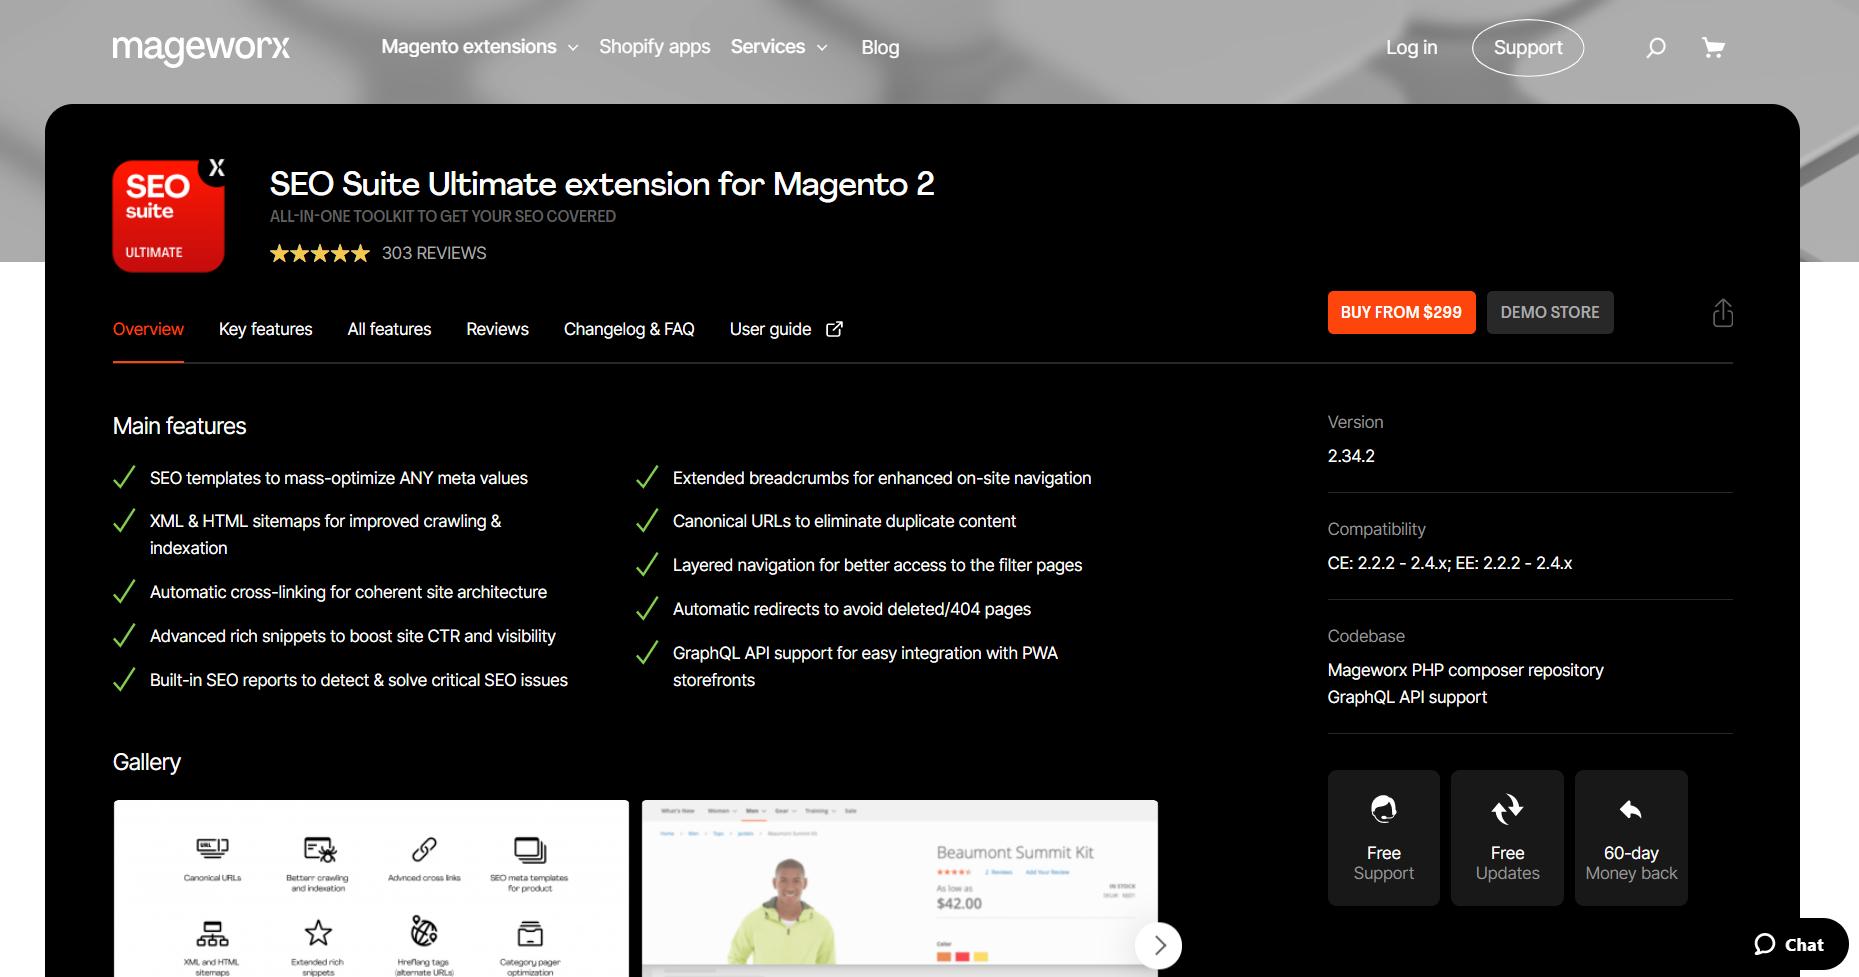 best magento extensions - Mageworx SEO Suite